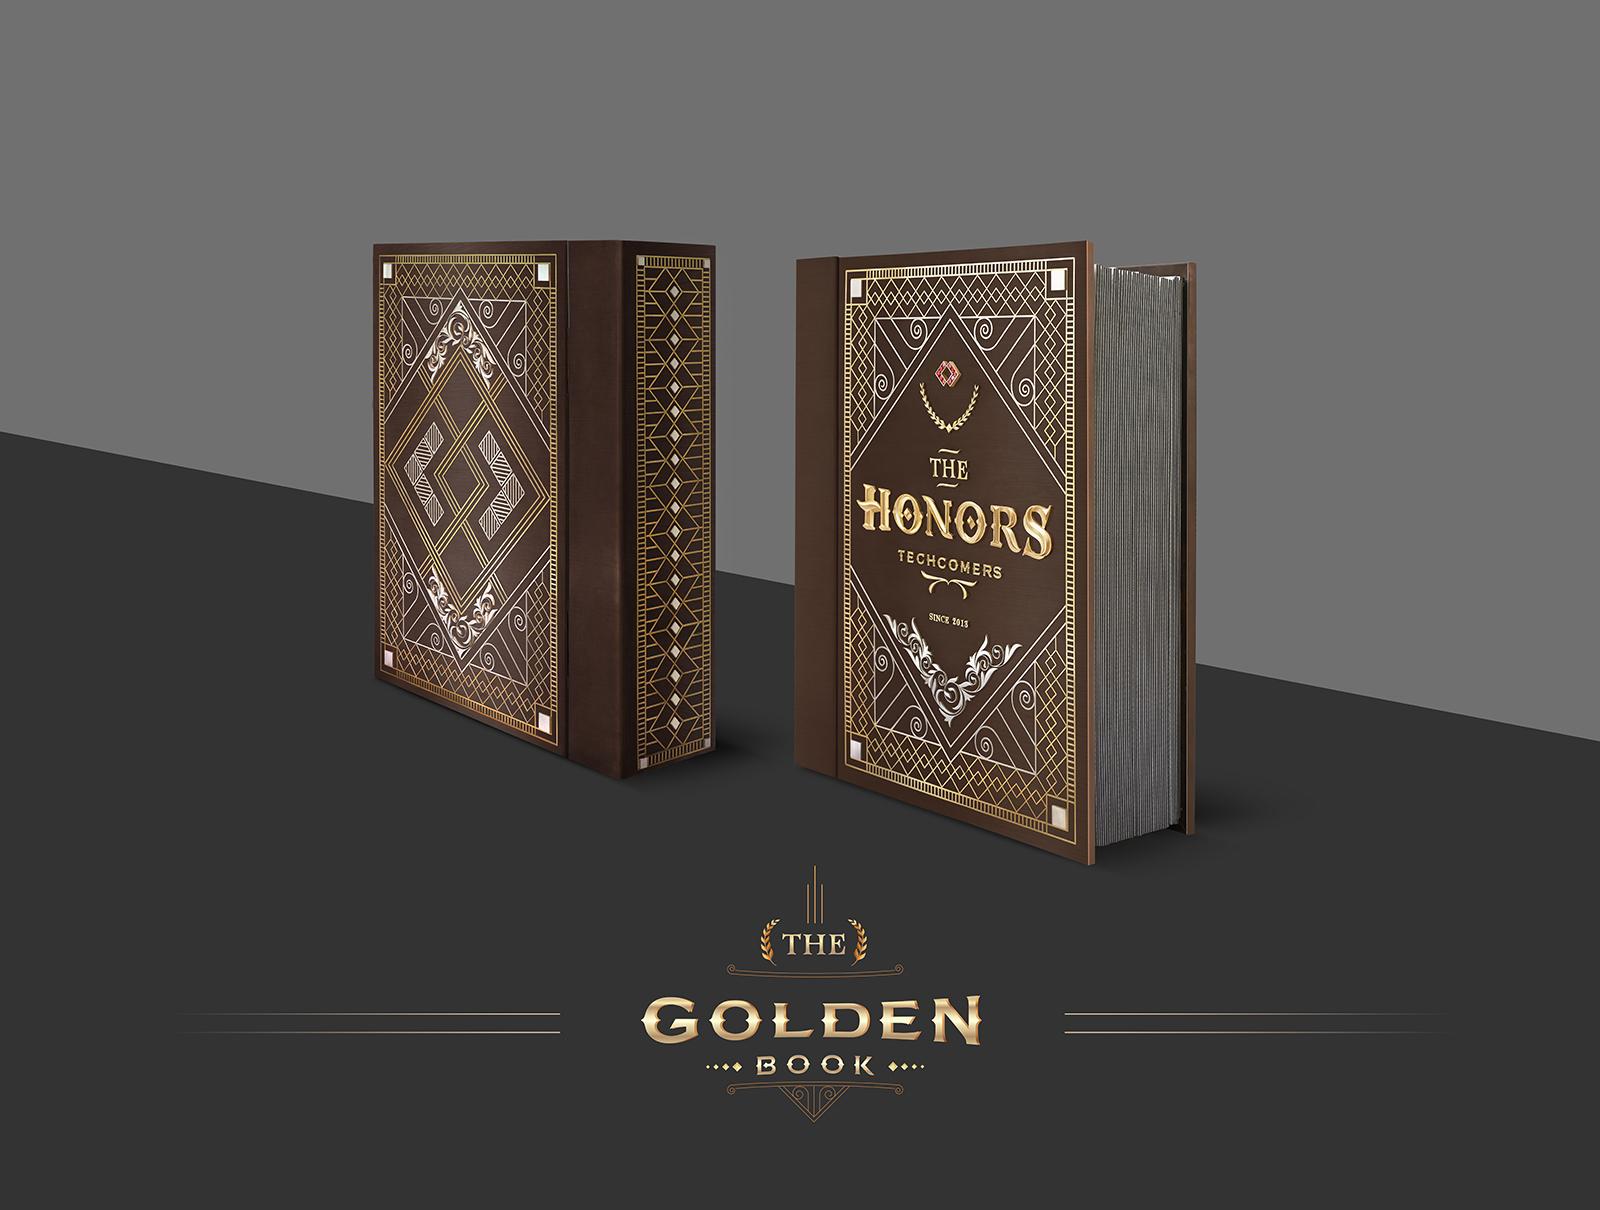 goldbook-techcombank-bratus agency-design agency vietnam